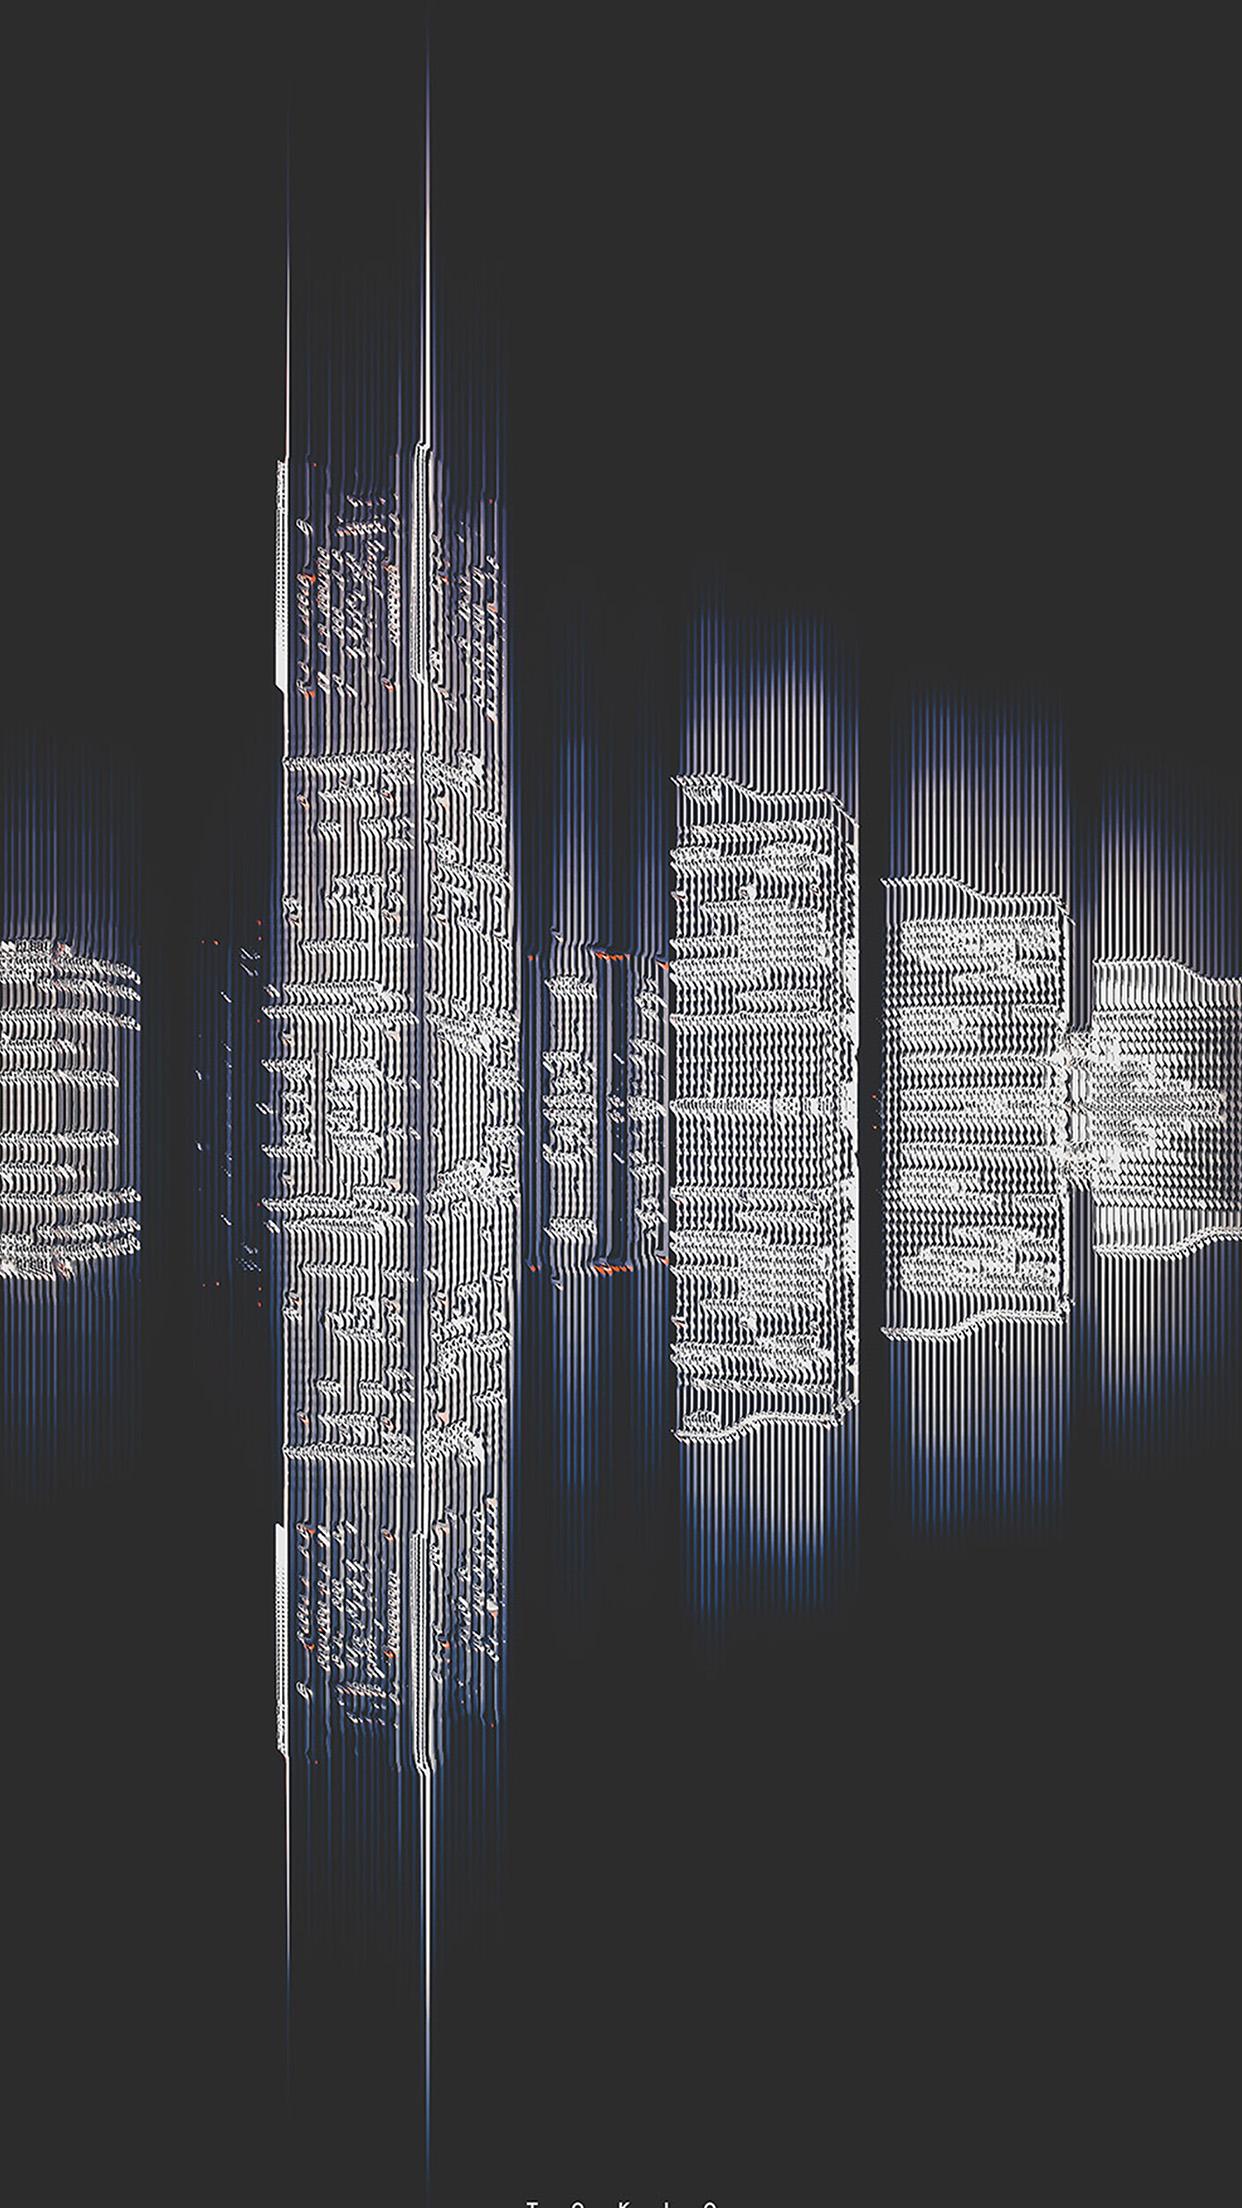 Vx35 Tokyo Building Pattern Background Wallpaper